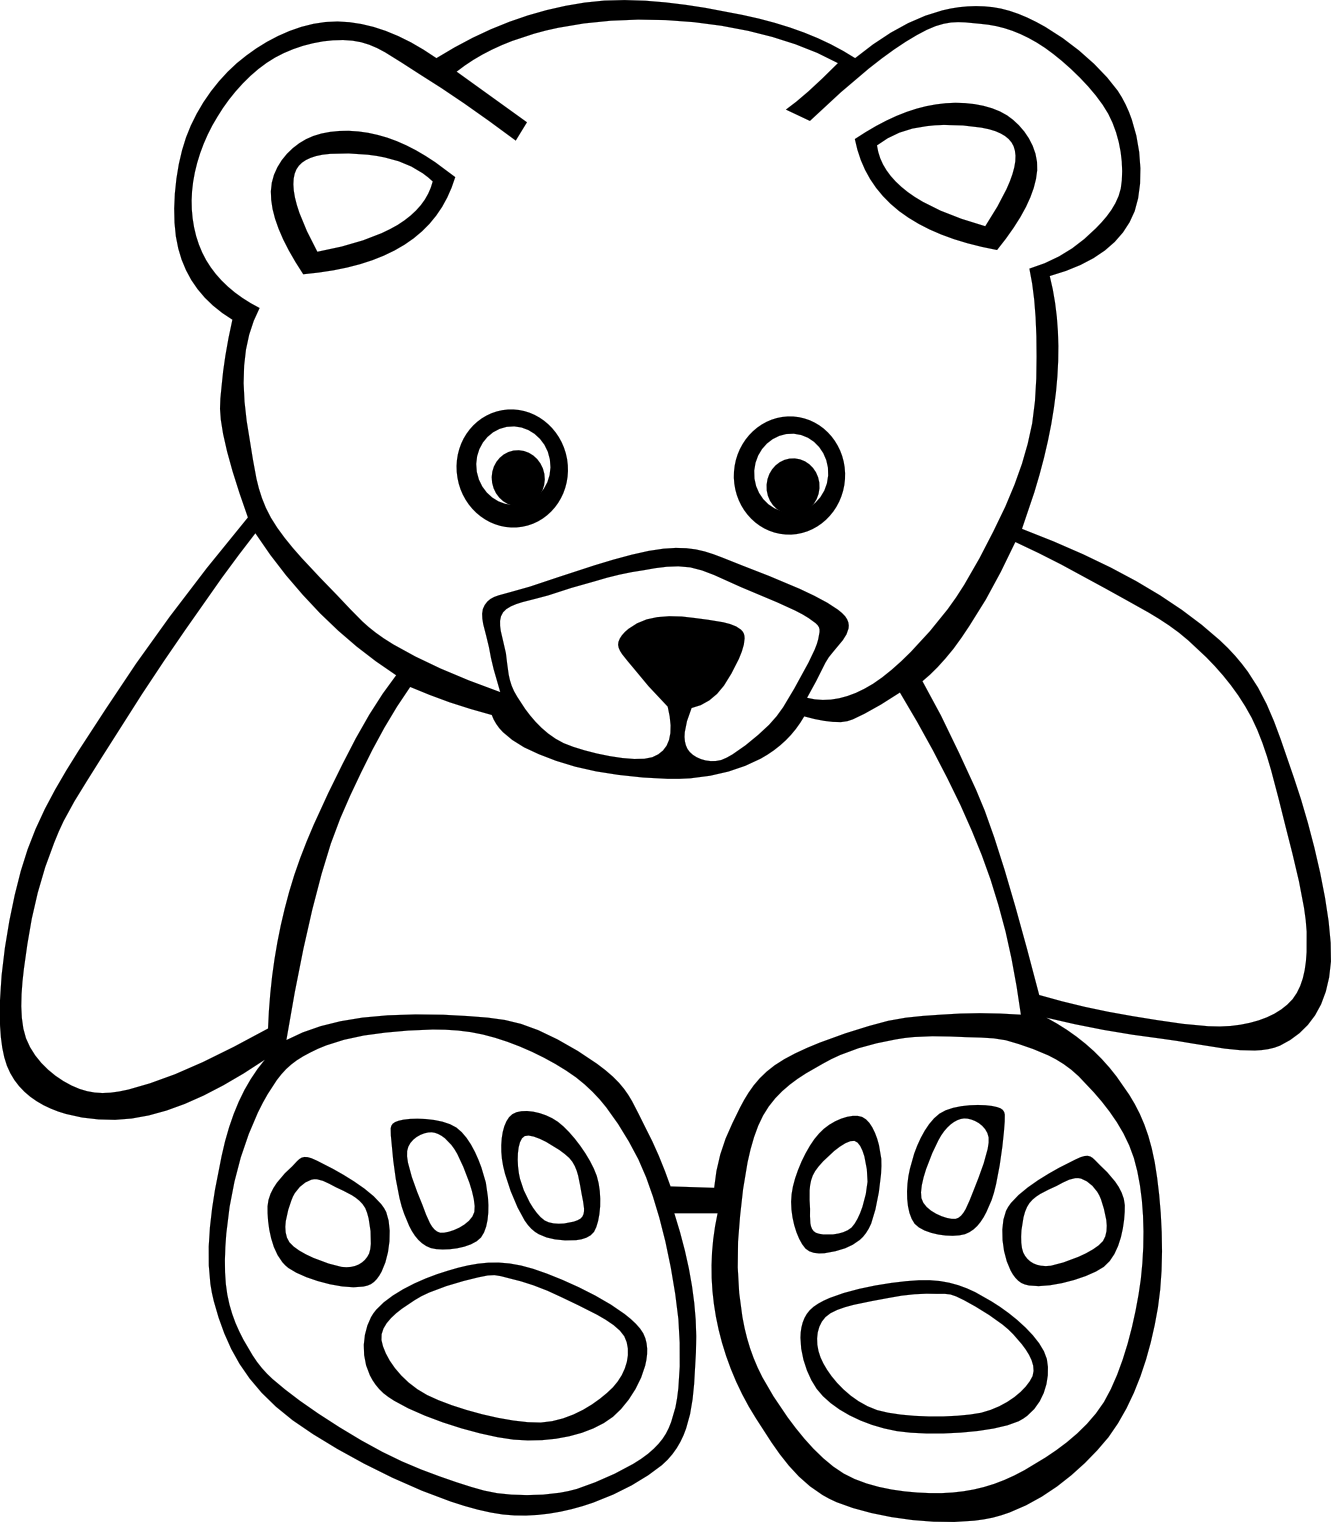 1331x1522 Bear Cub Clipart Black And White